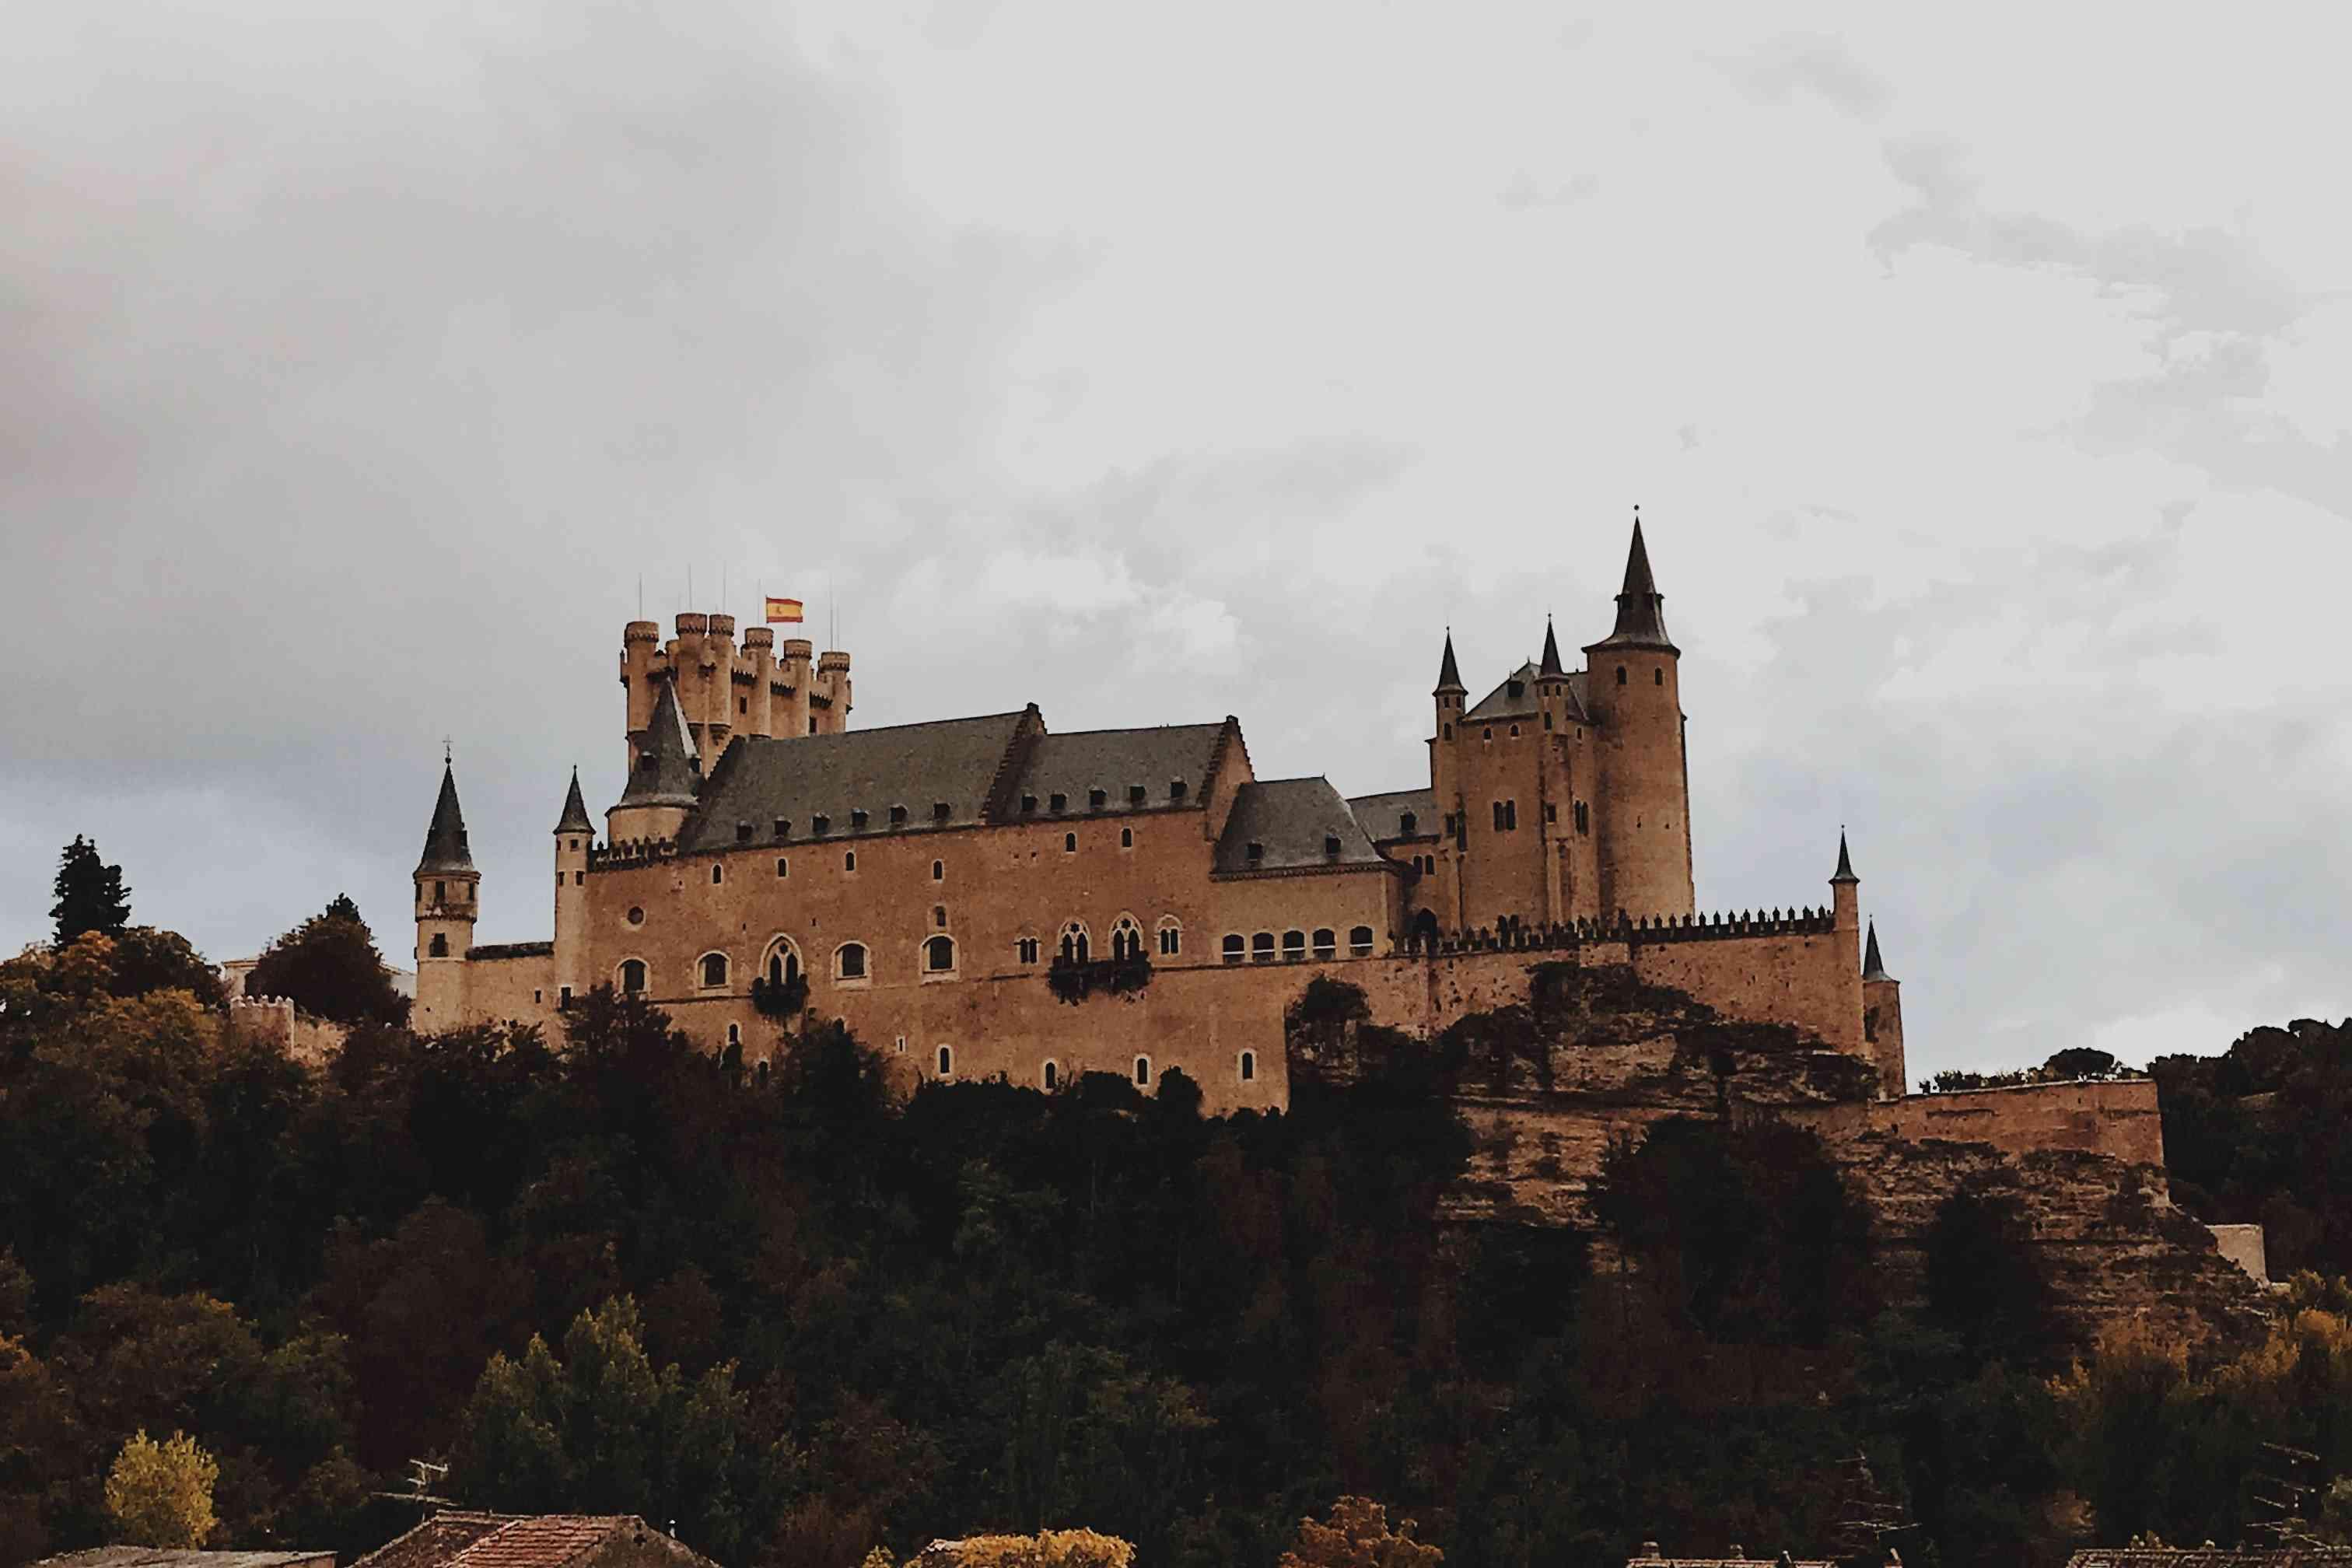 A castle in Segovia, Spain